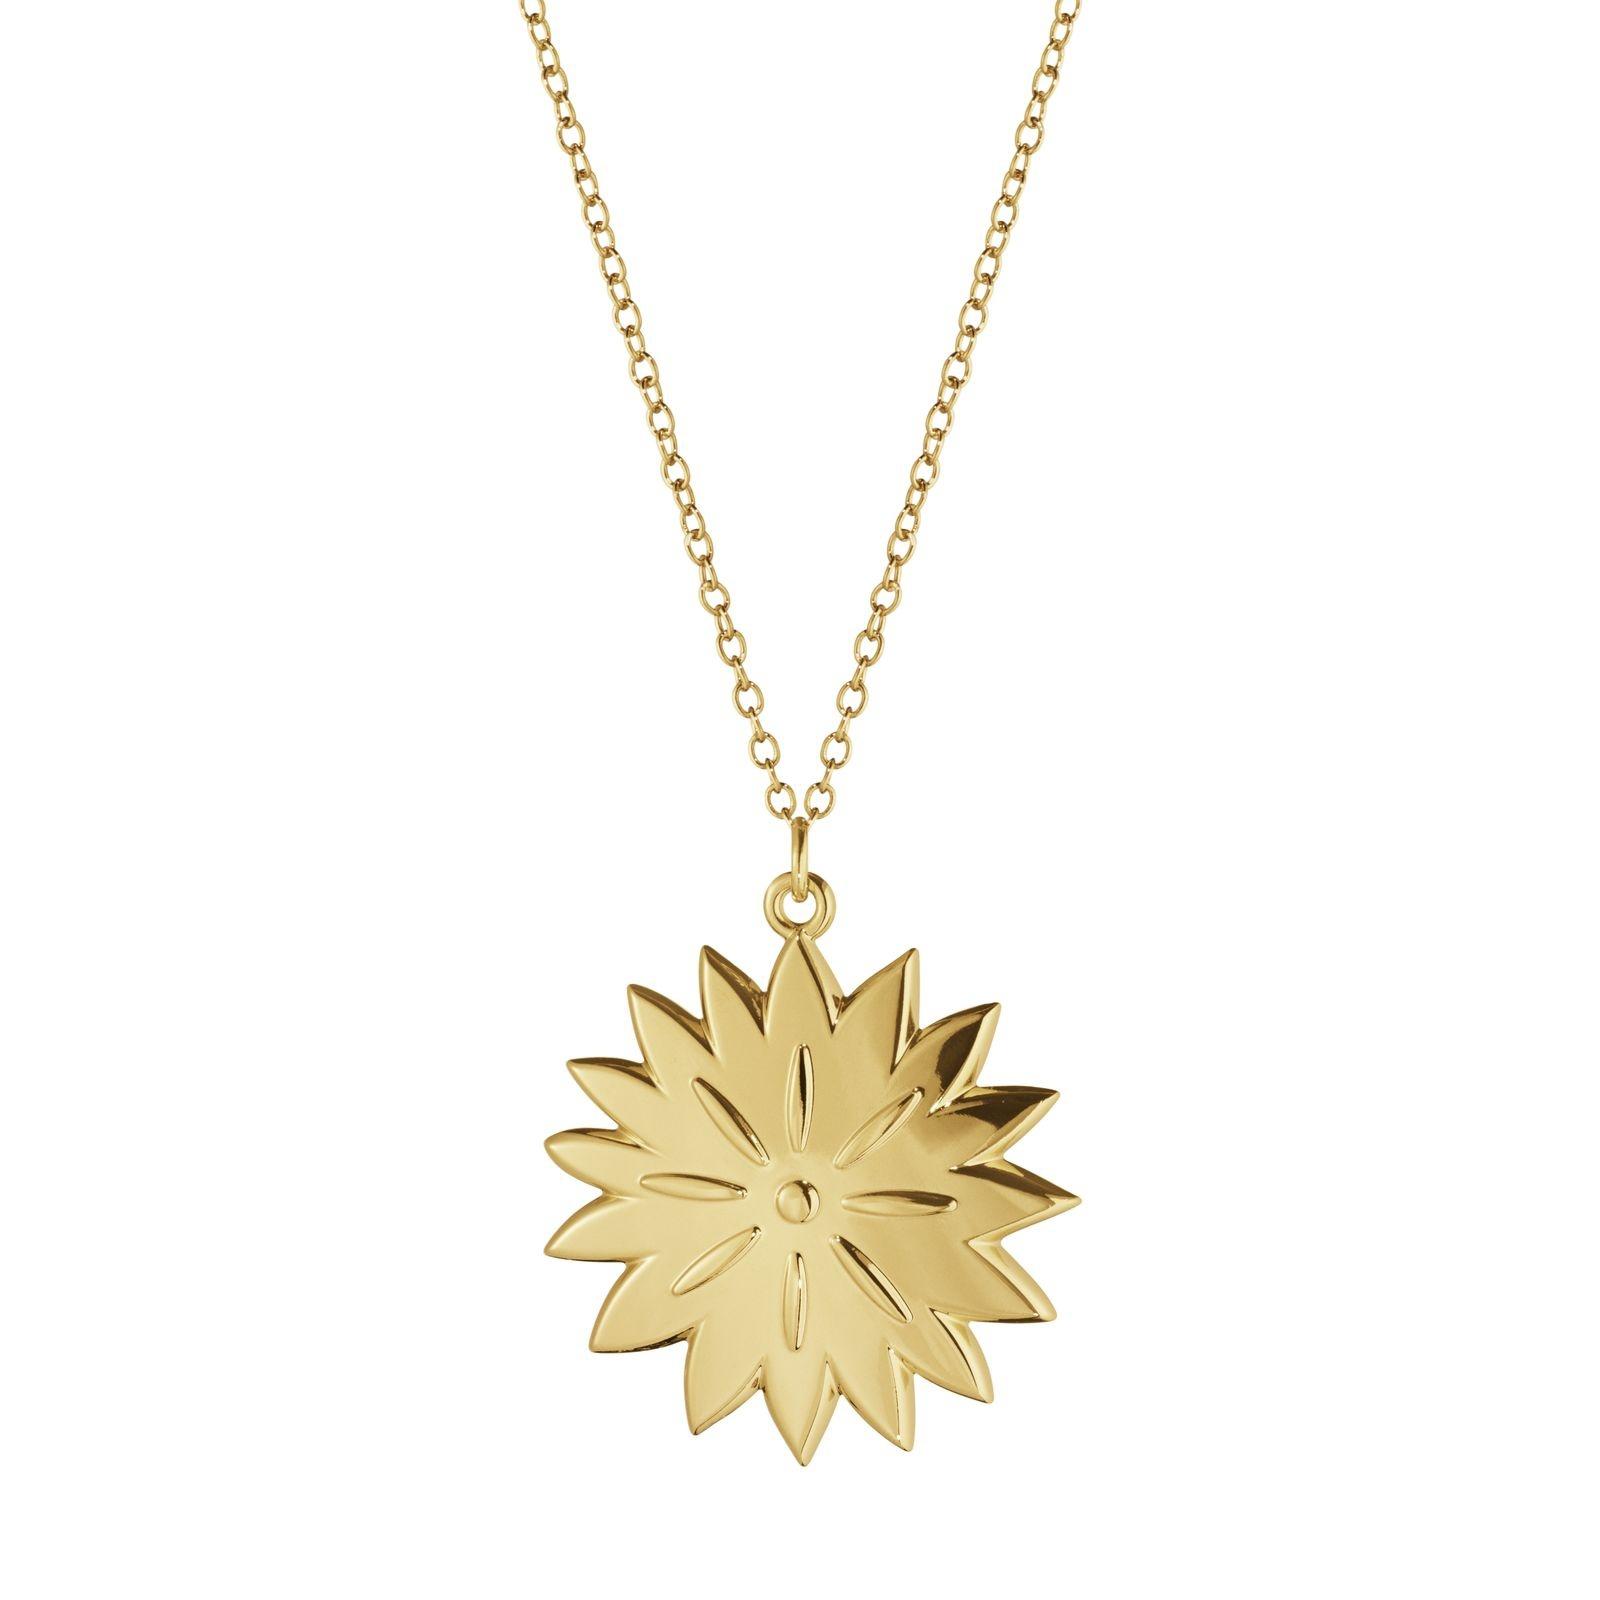 Georg Jensen Kerst 2020 Ornament Ijs Dianthus